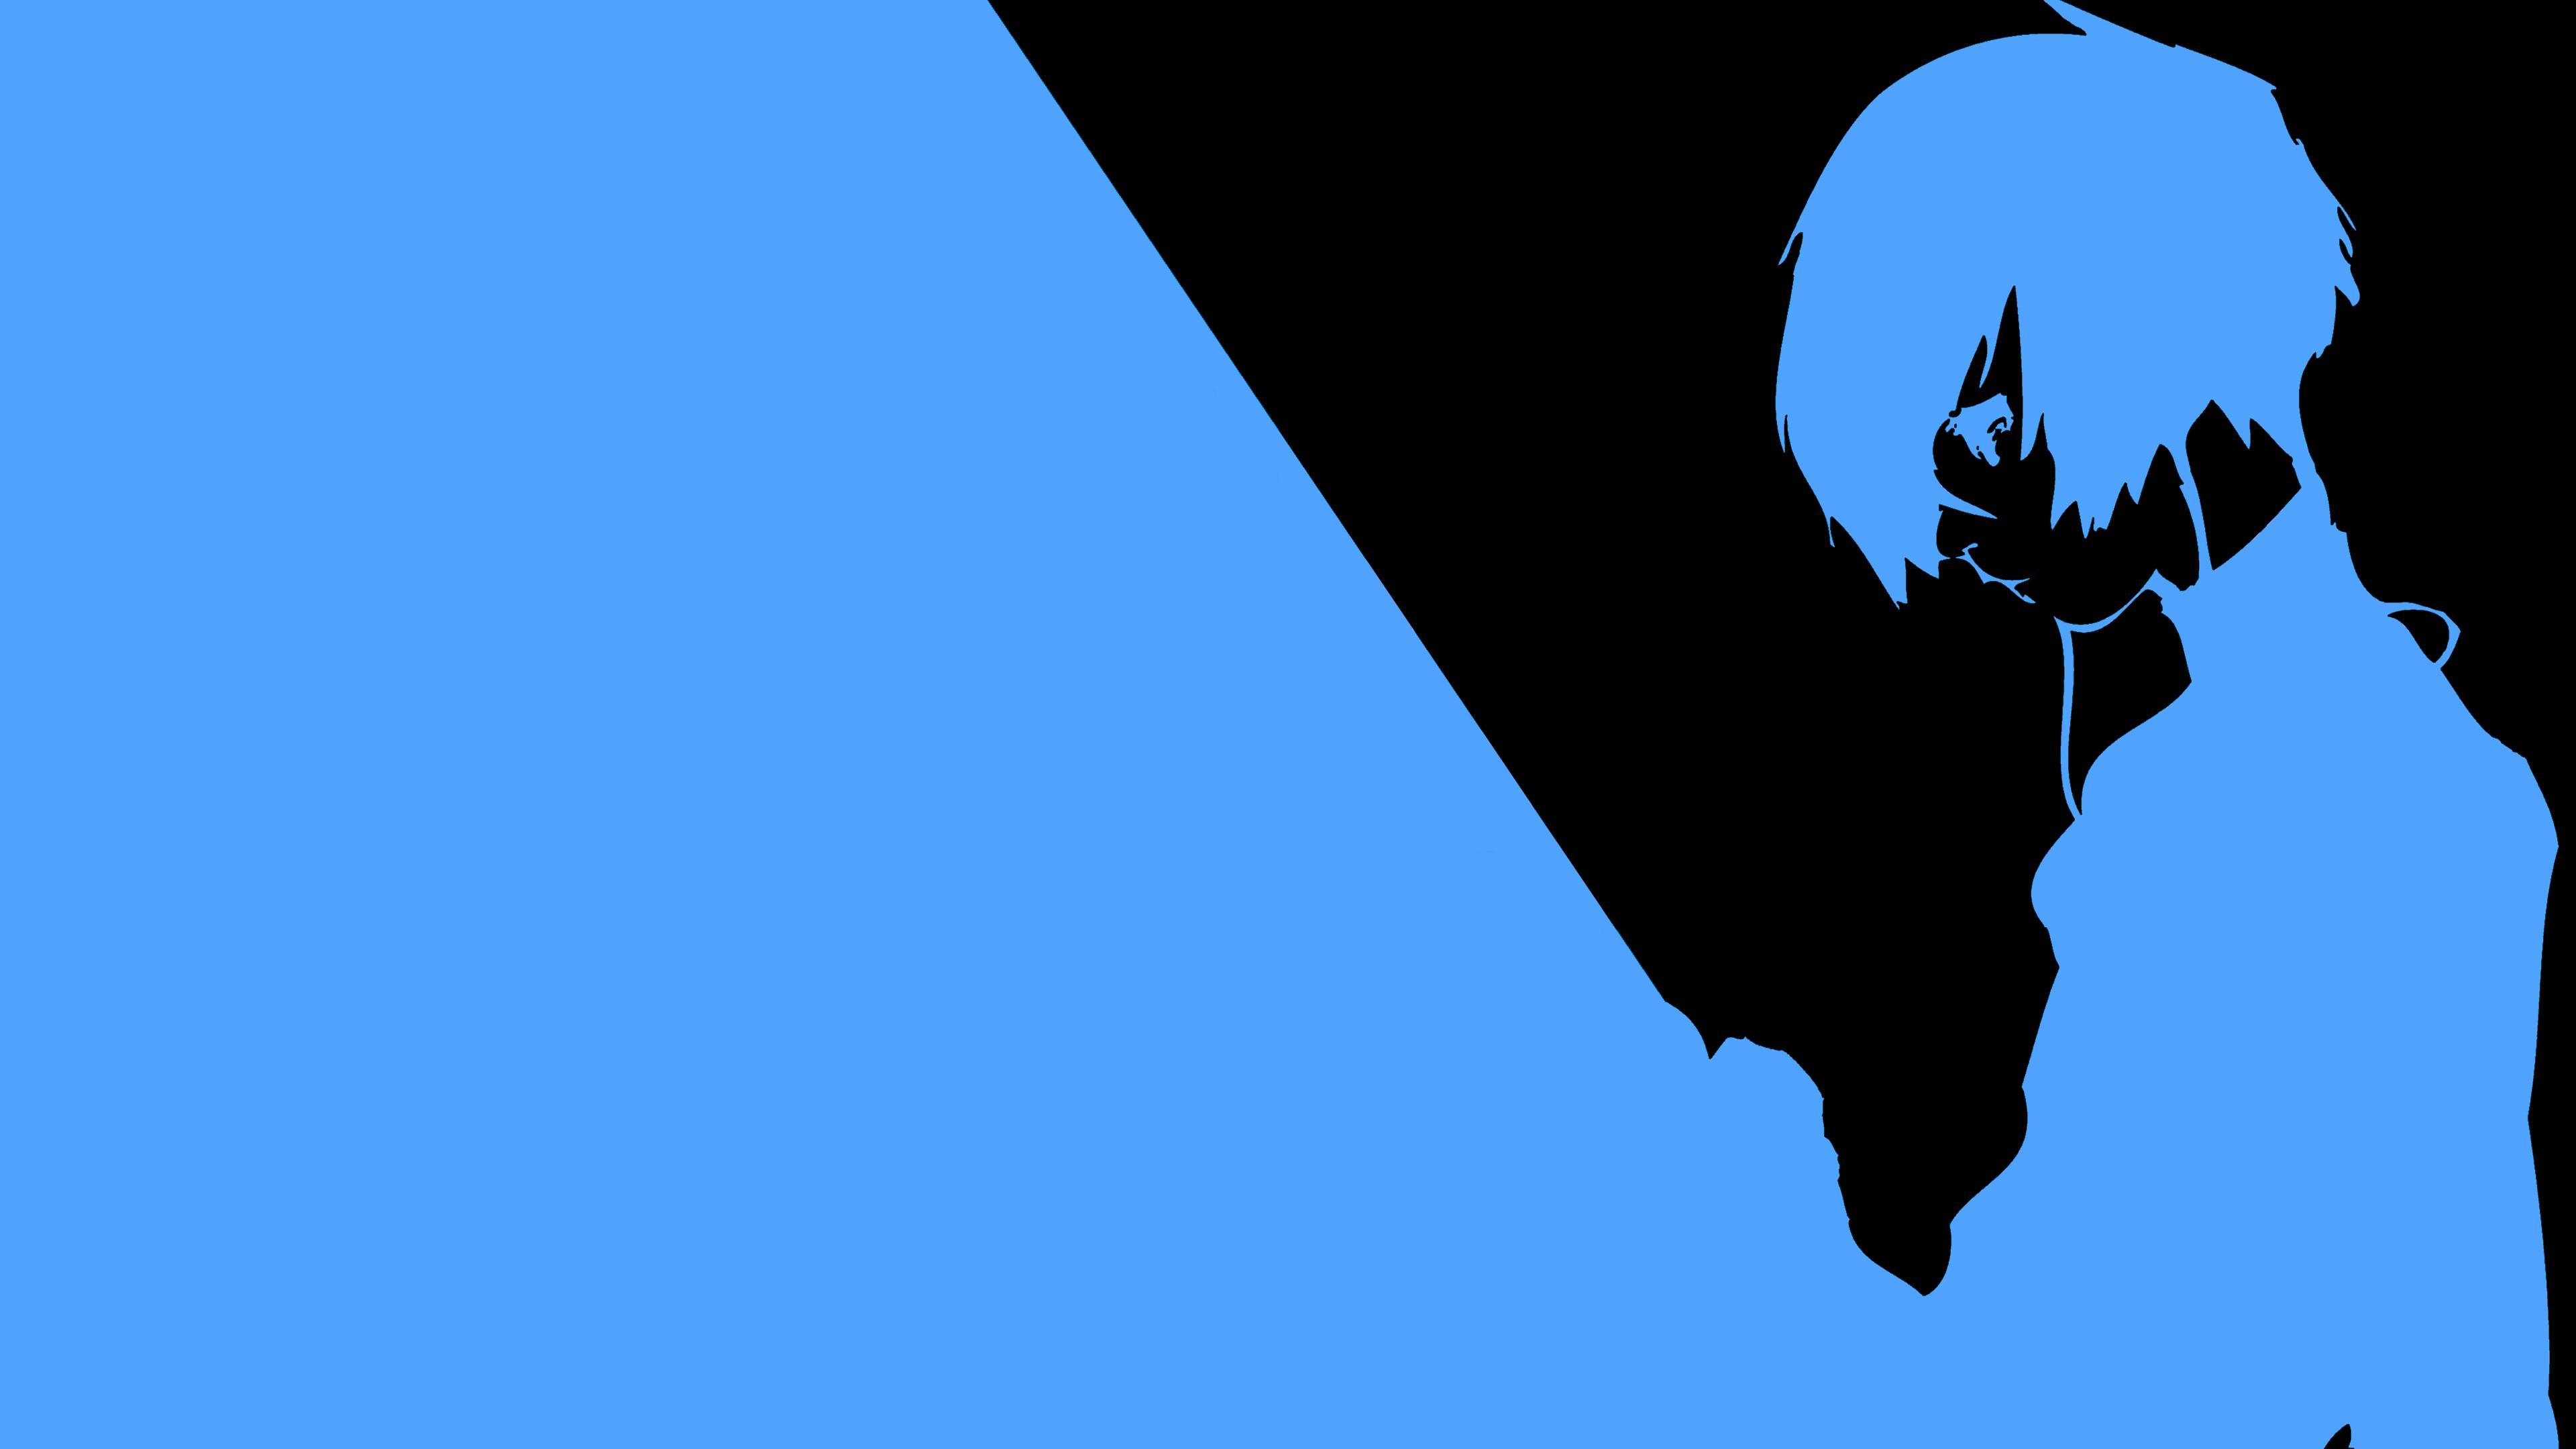 Persona 3 wallpaper ·① Download free cool full HD ...